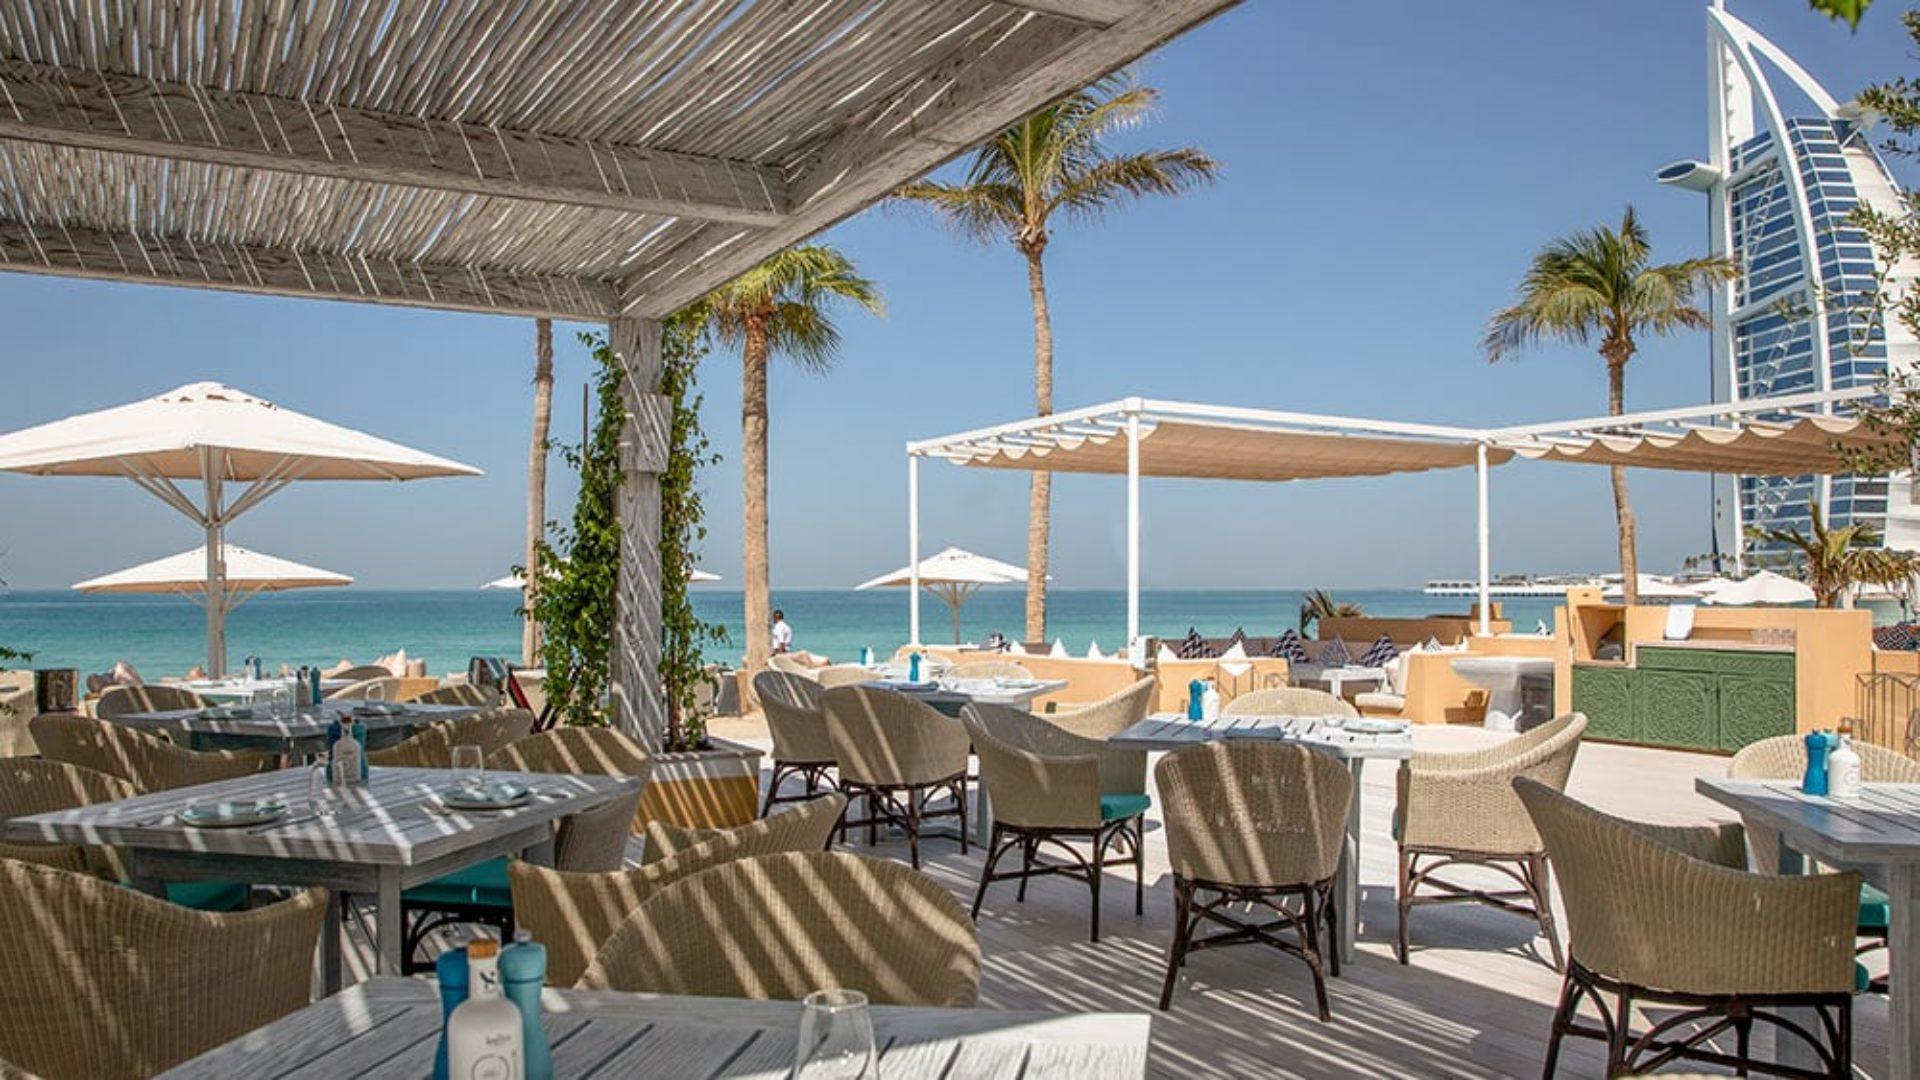 Outdoor terrace of Shimmers Restaurant at Jumeirah Mina A'Salam